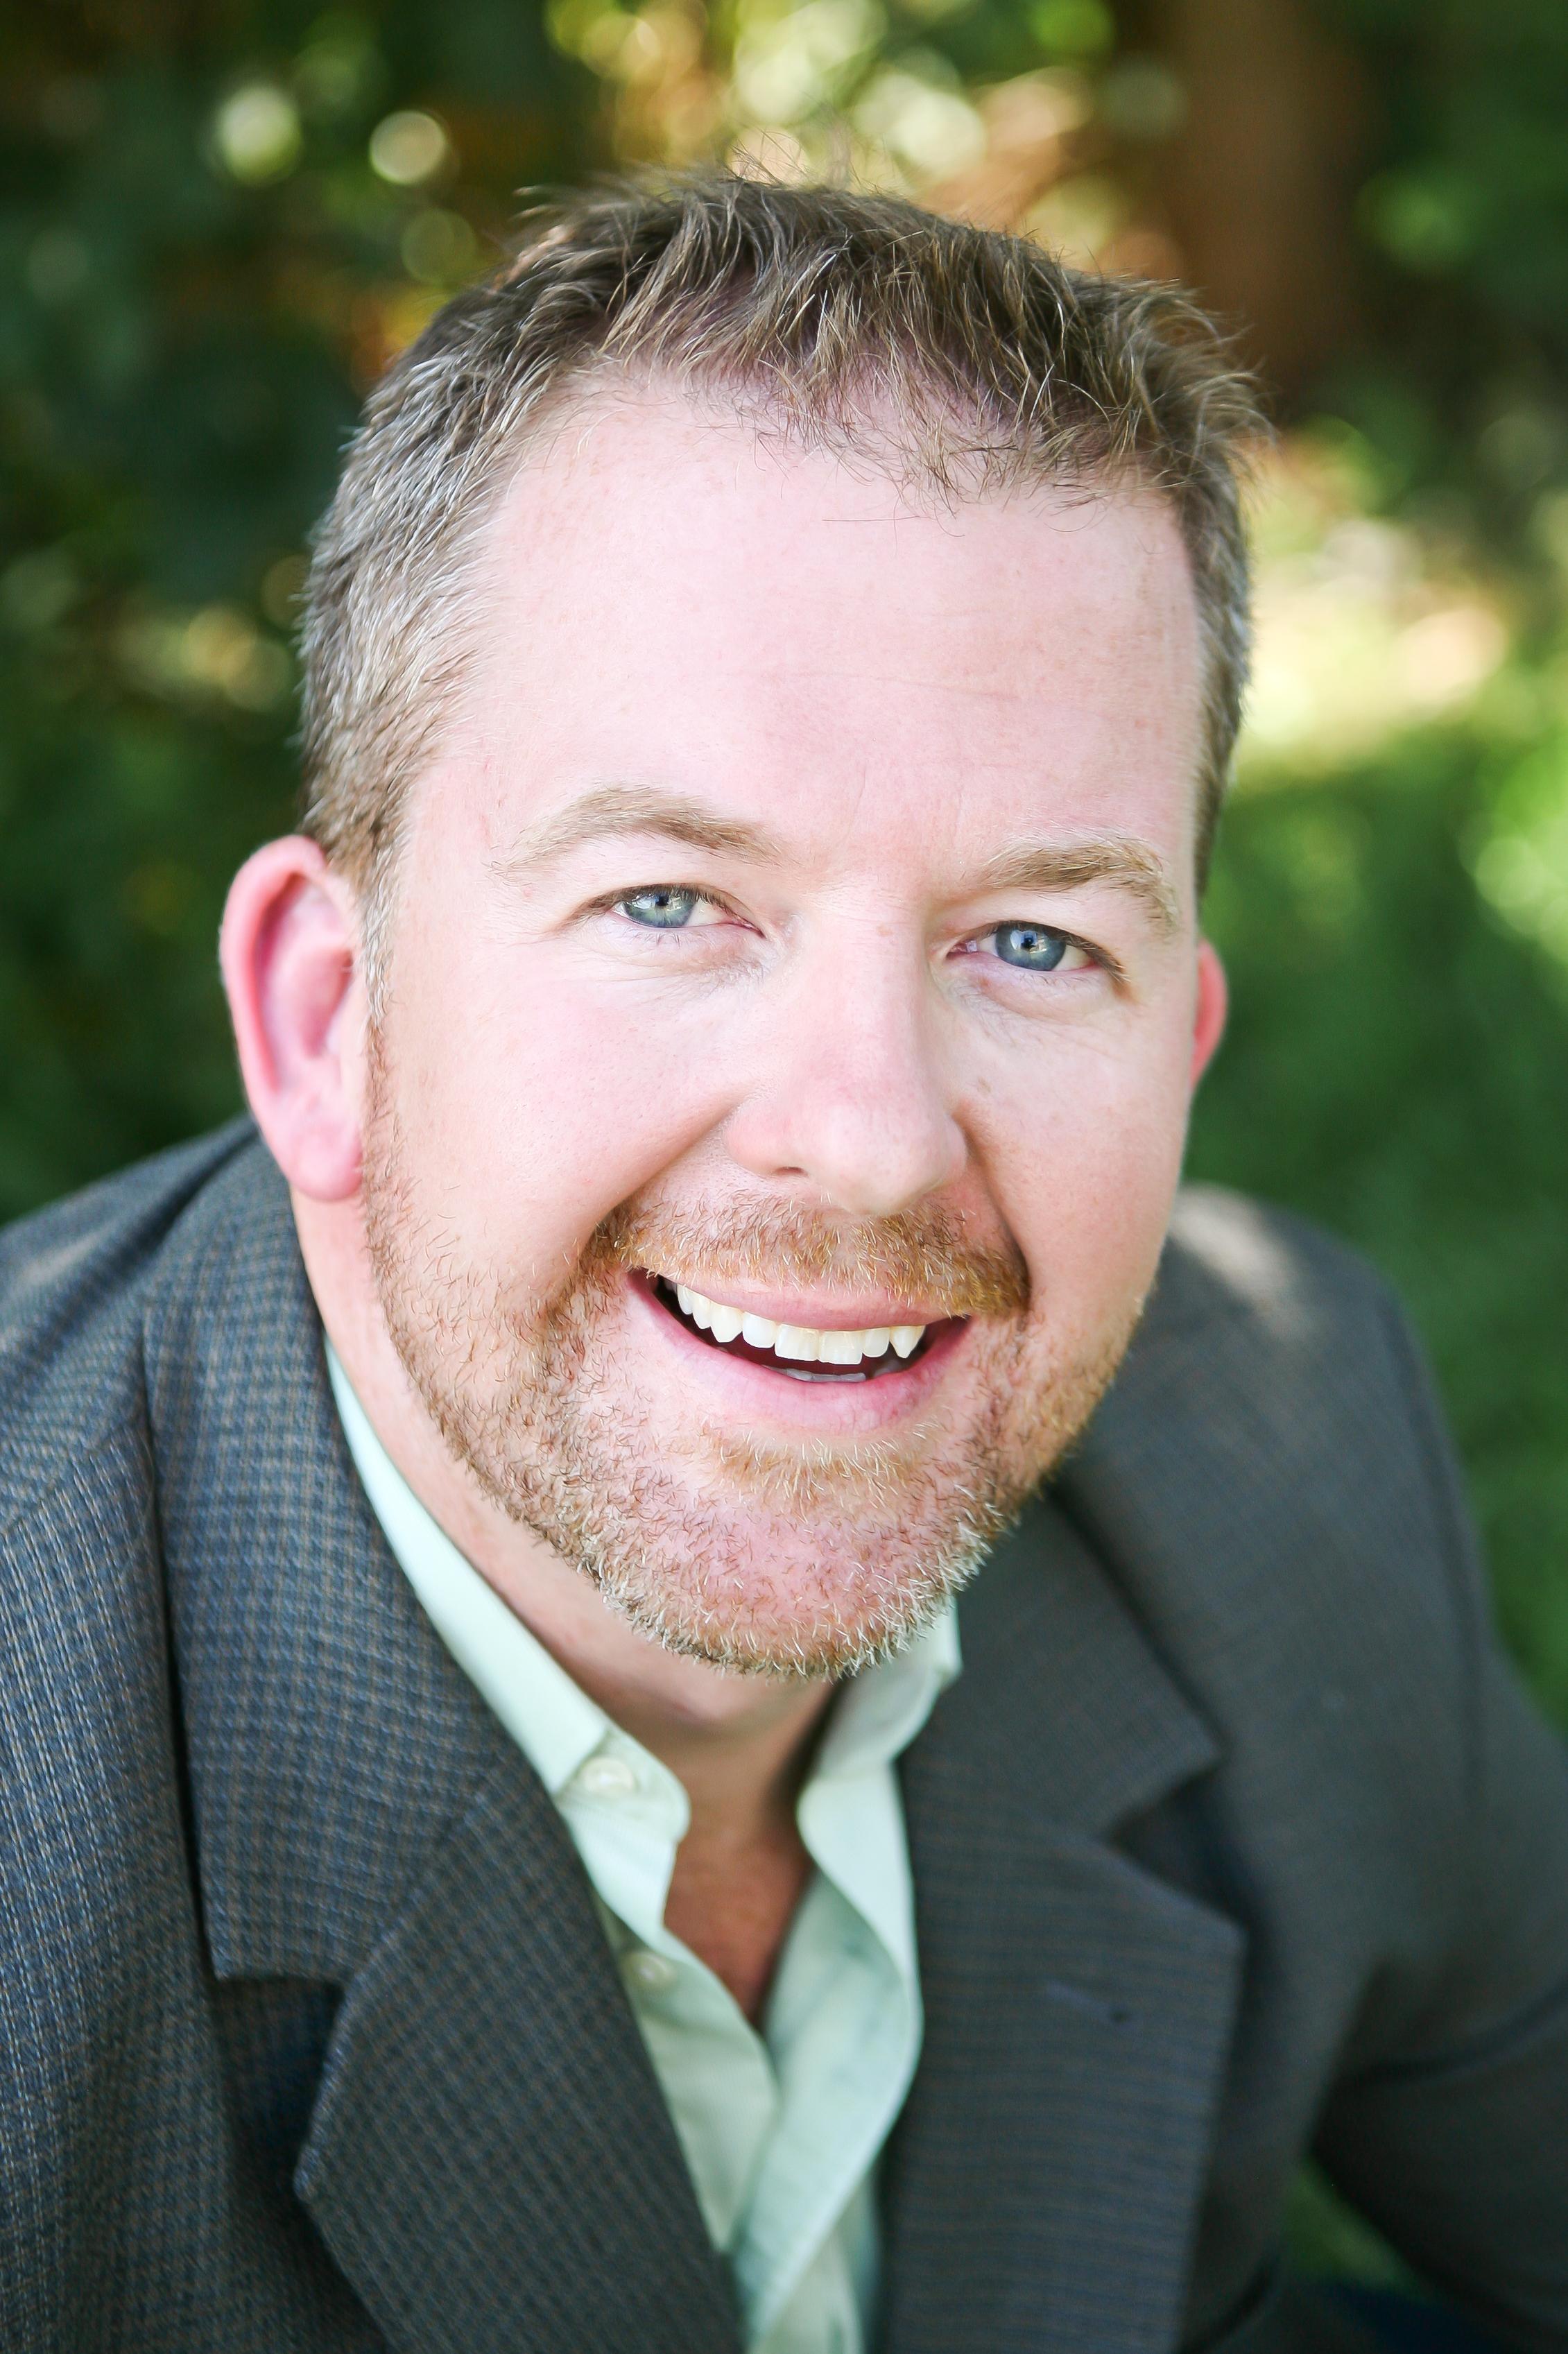 Todd Paxton